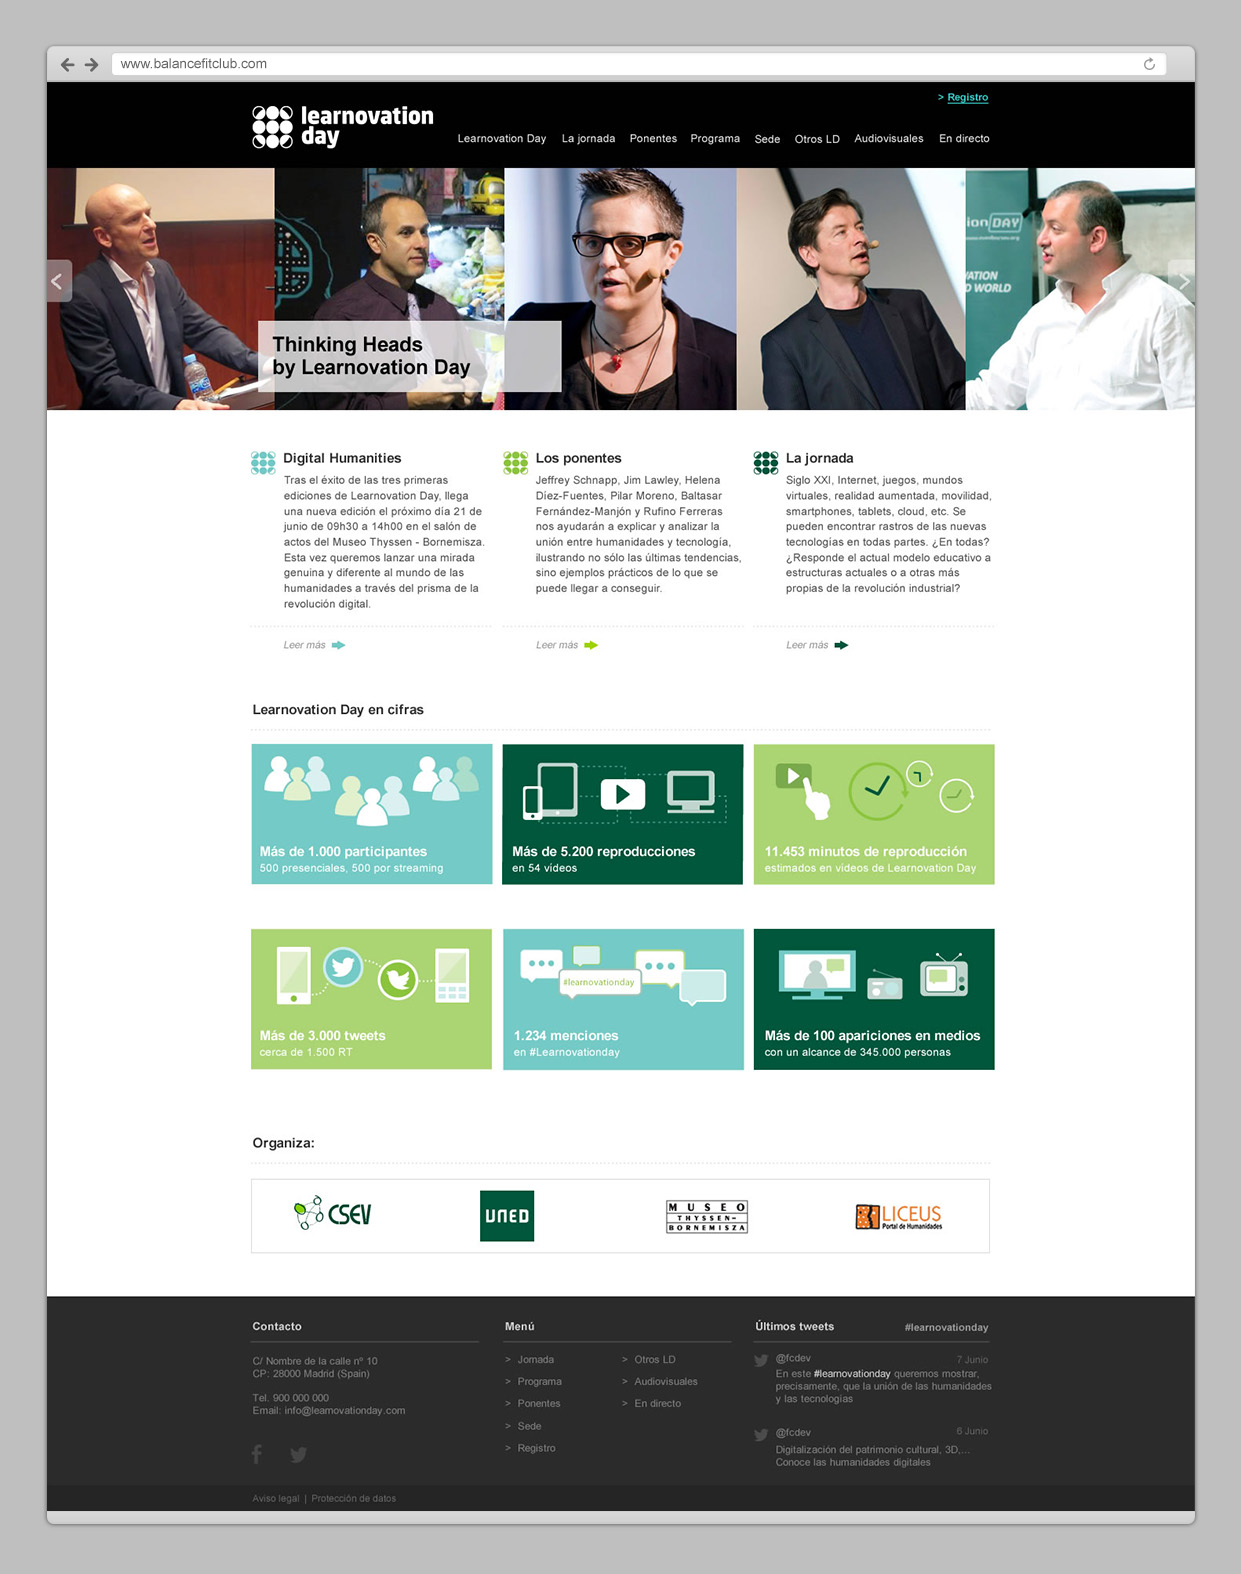 learnovationday_web_03.jpg